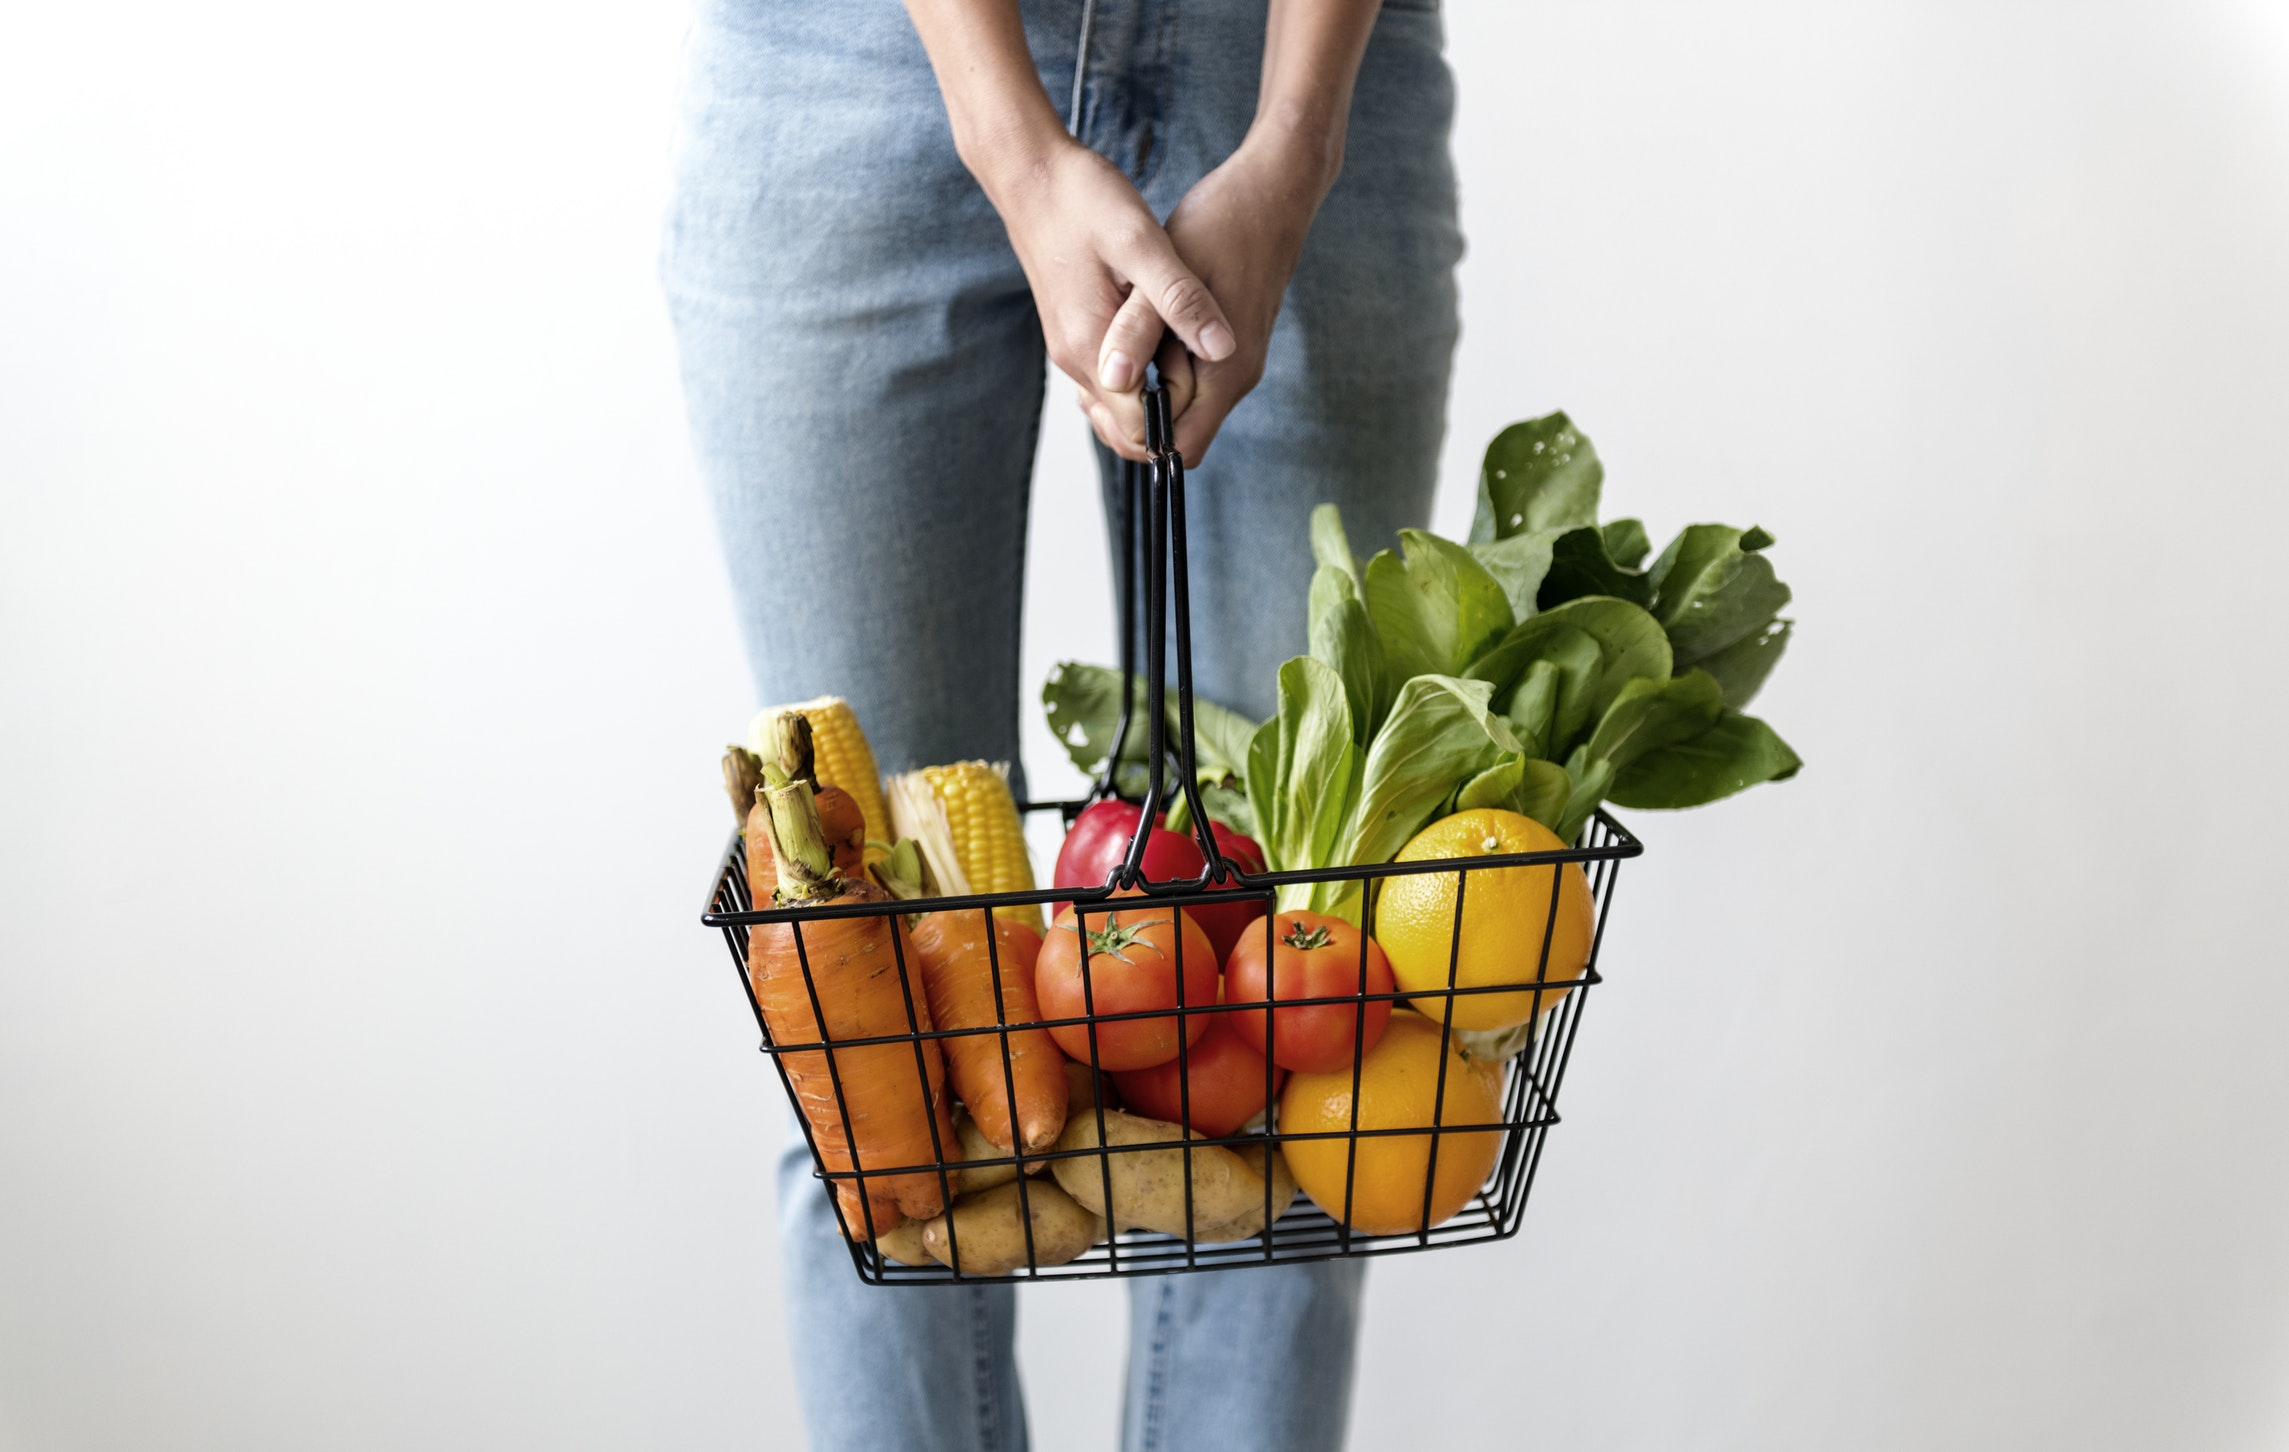 Veganism big business 2018 - Emma Sinclair MBE | BRIGHT Zine.jpeg